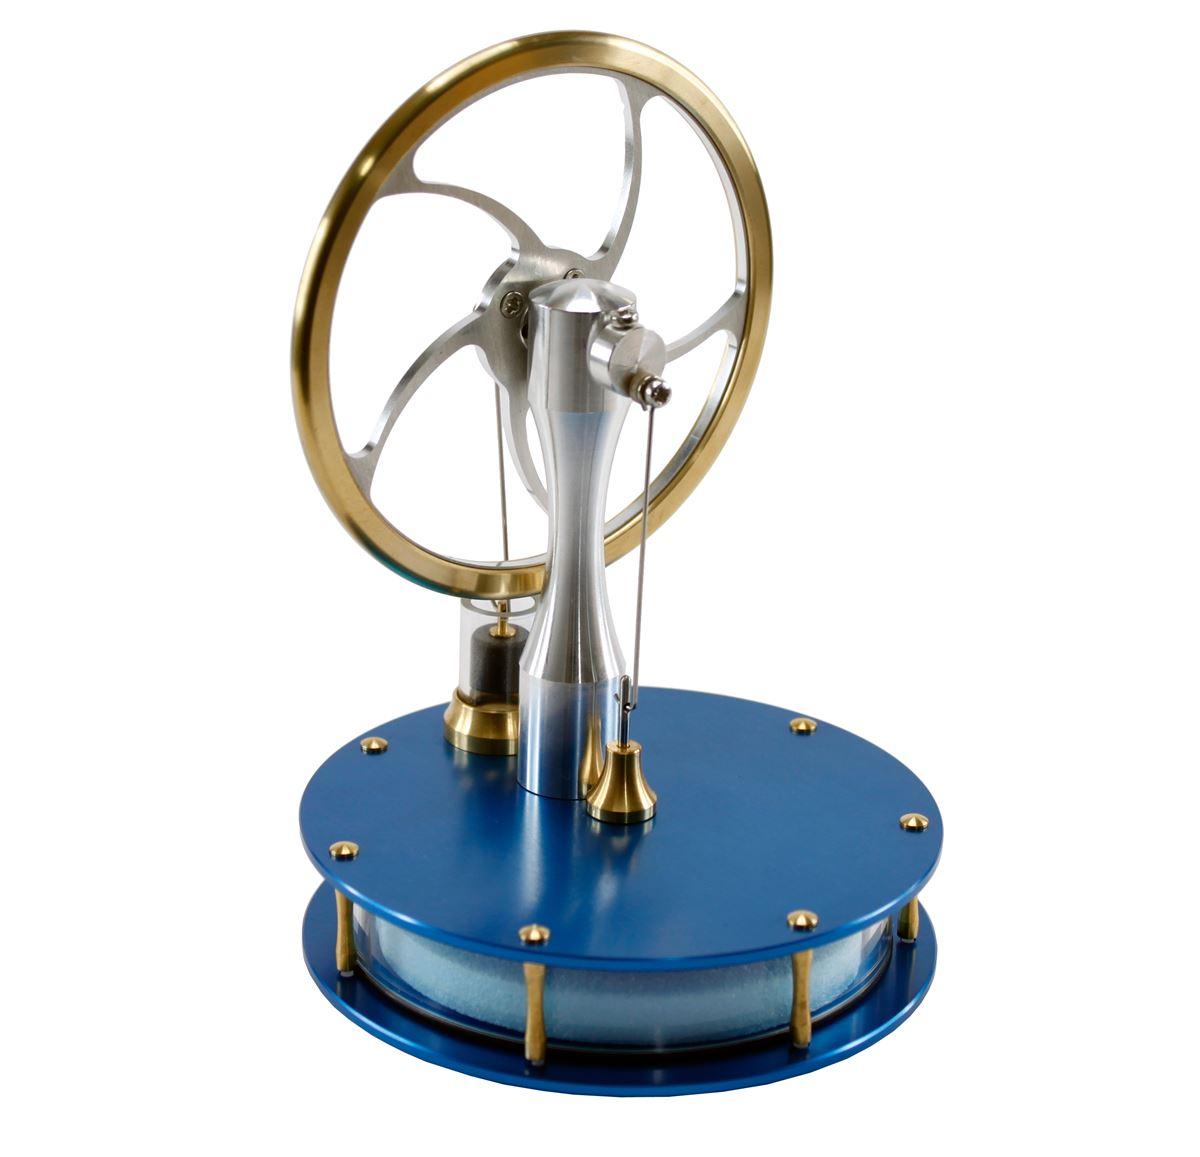 Precision Stirling Engine Blue Kit From Gyroscope Com